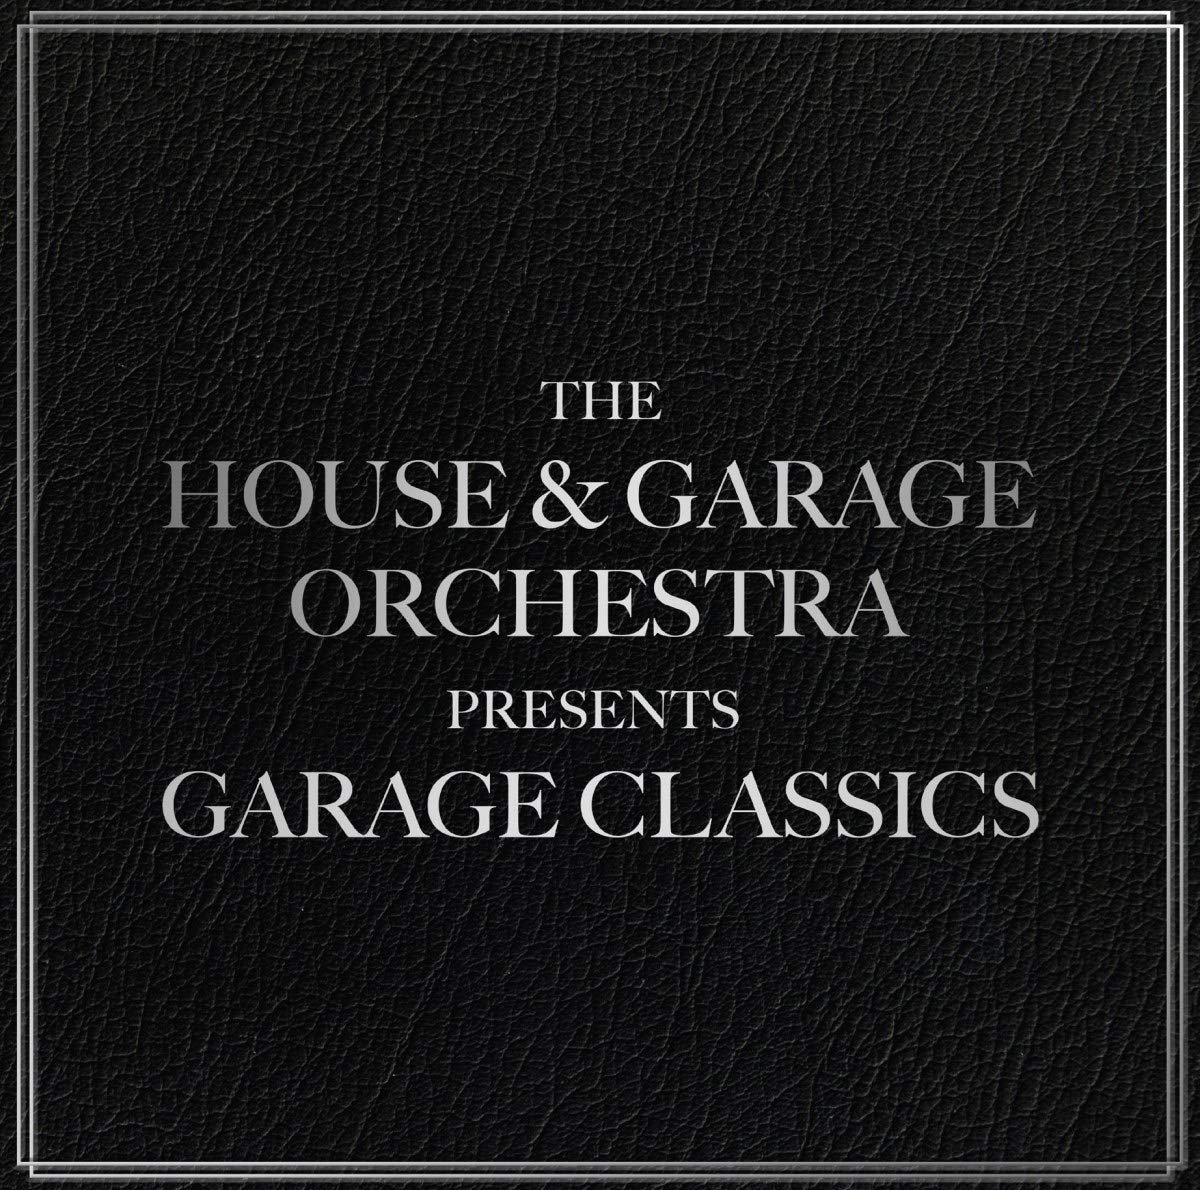 CD : House & Garage Orchestra - Garage Classics (United Kingdom - Import)